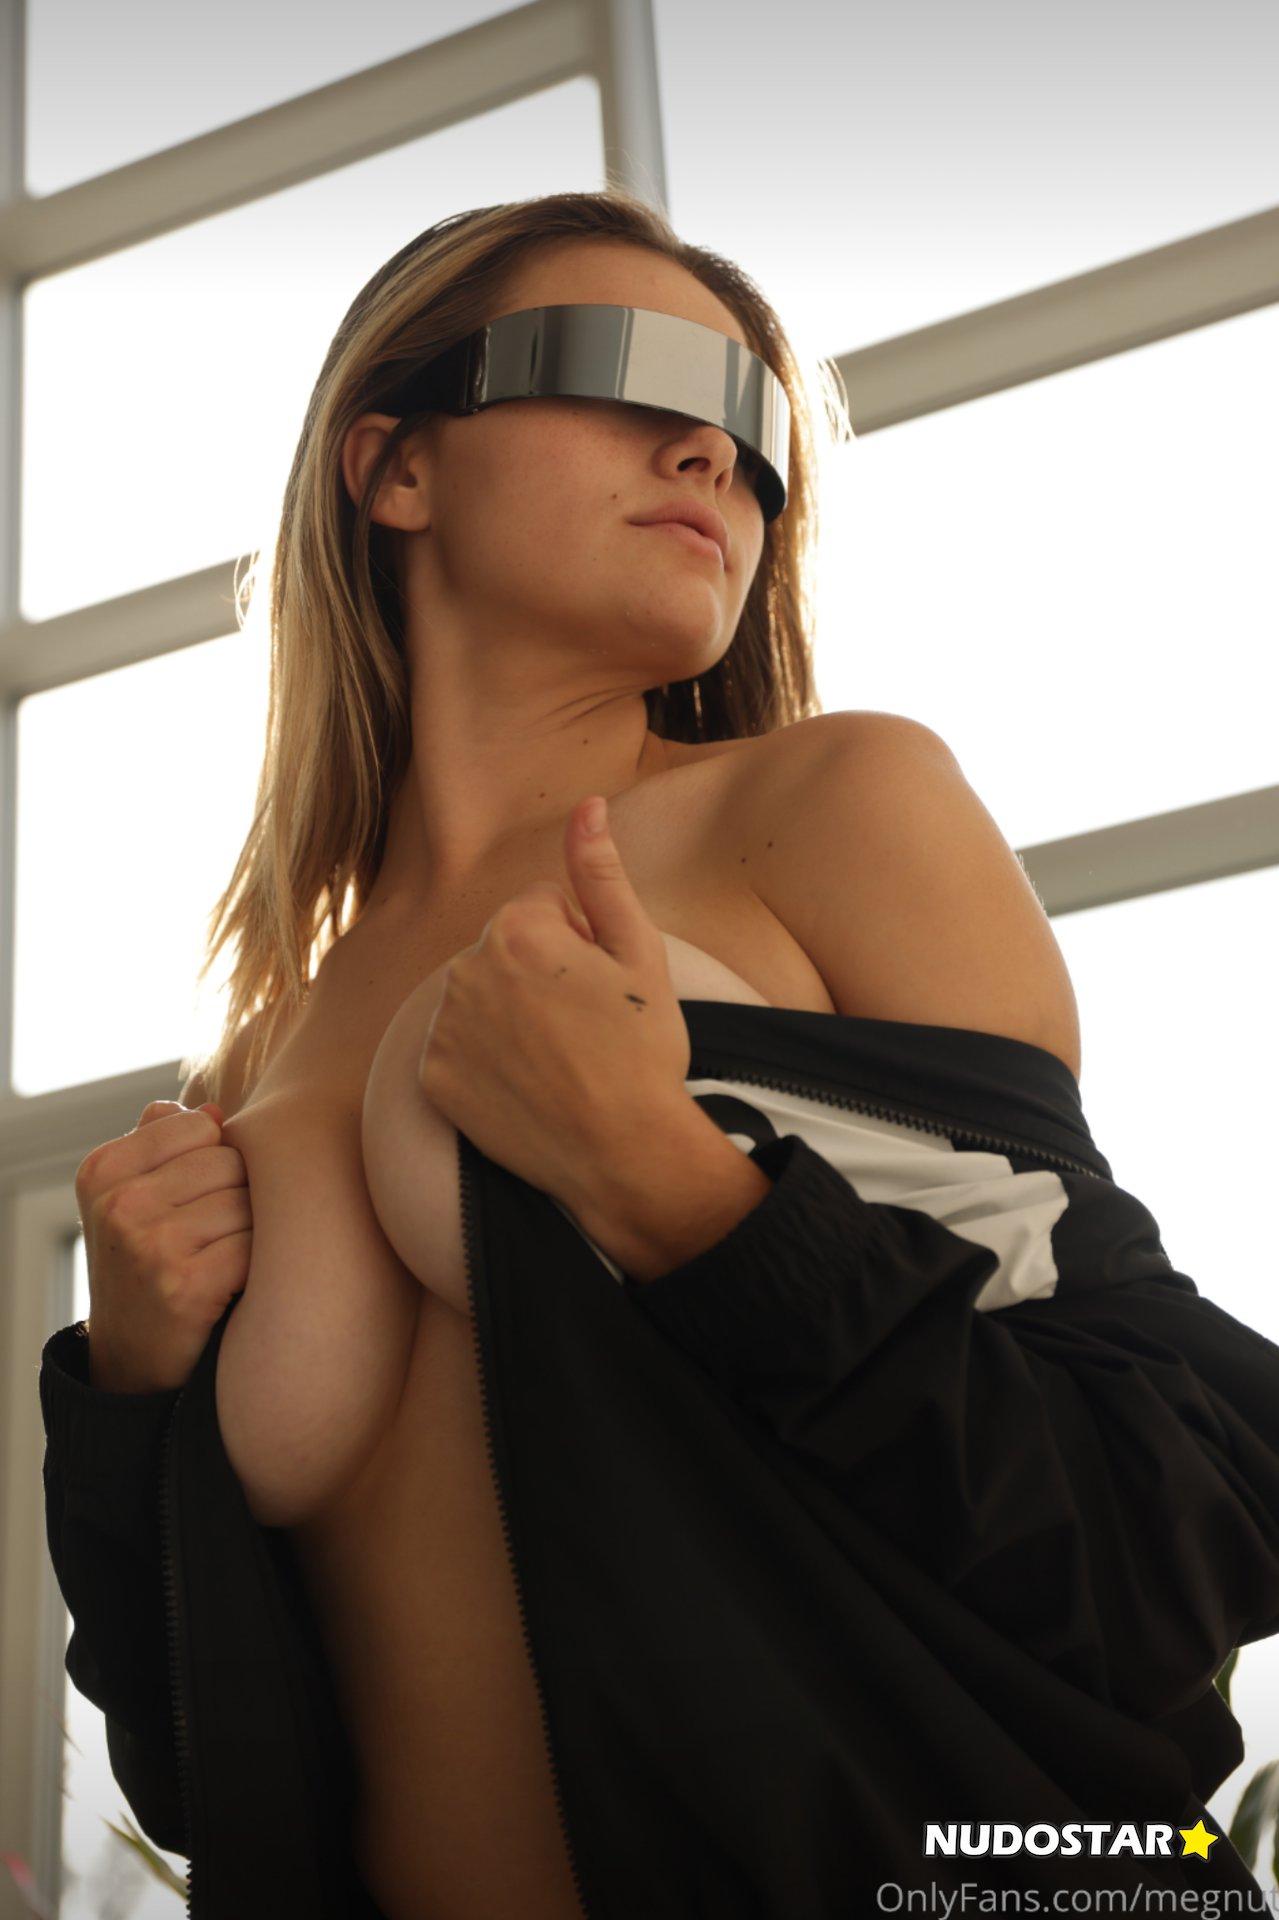 Megan Guthrie – Megnutt02 Nude Leaks 0017